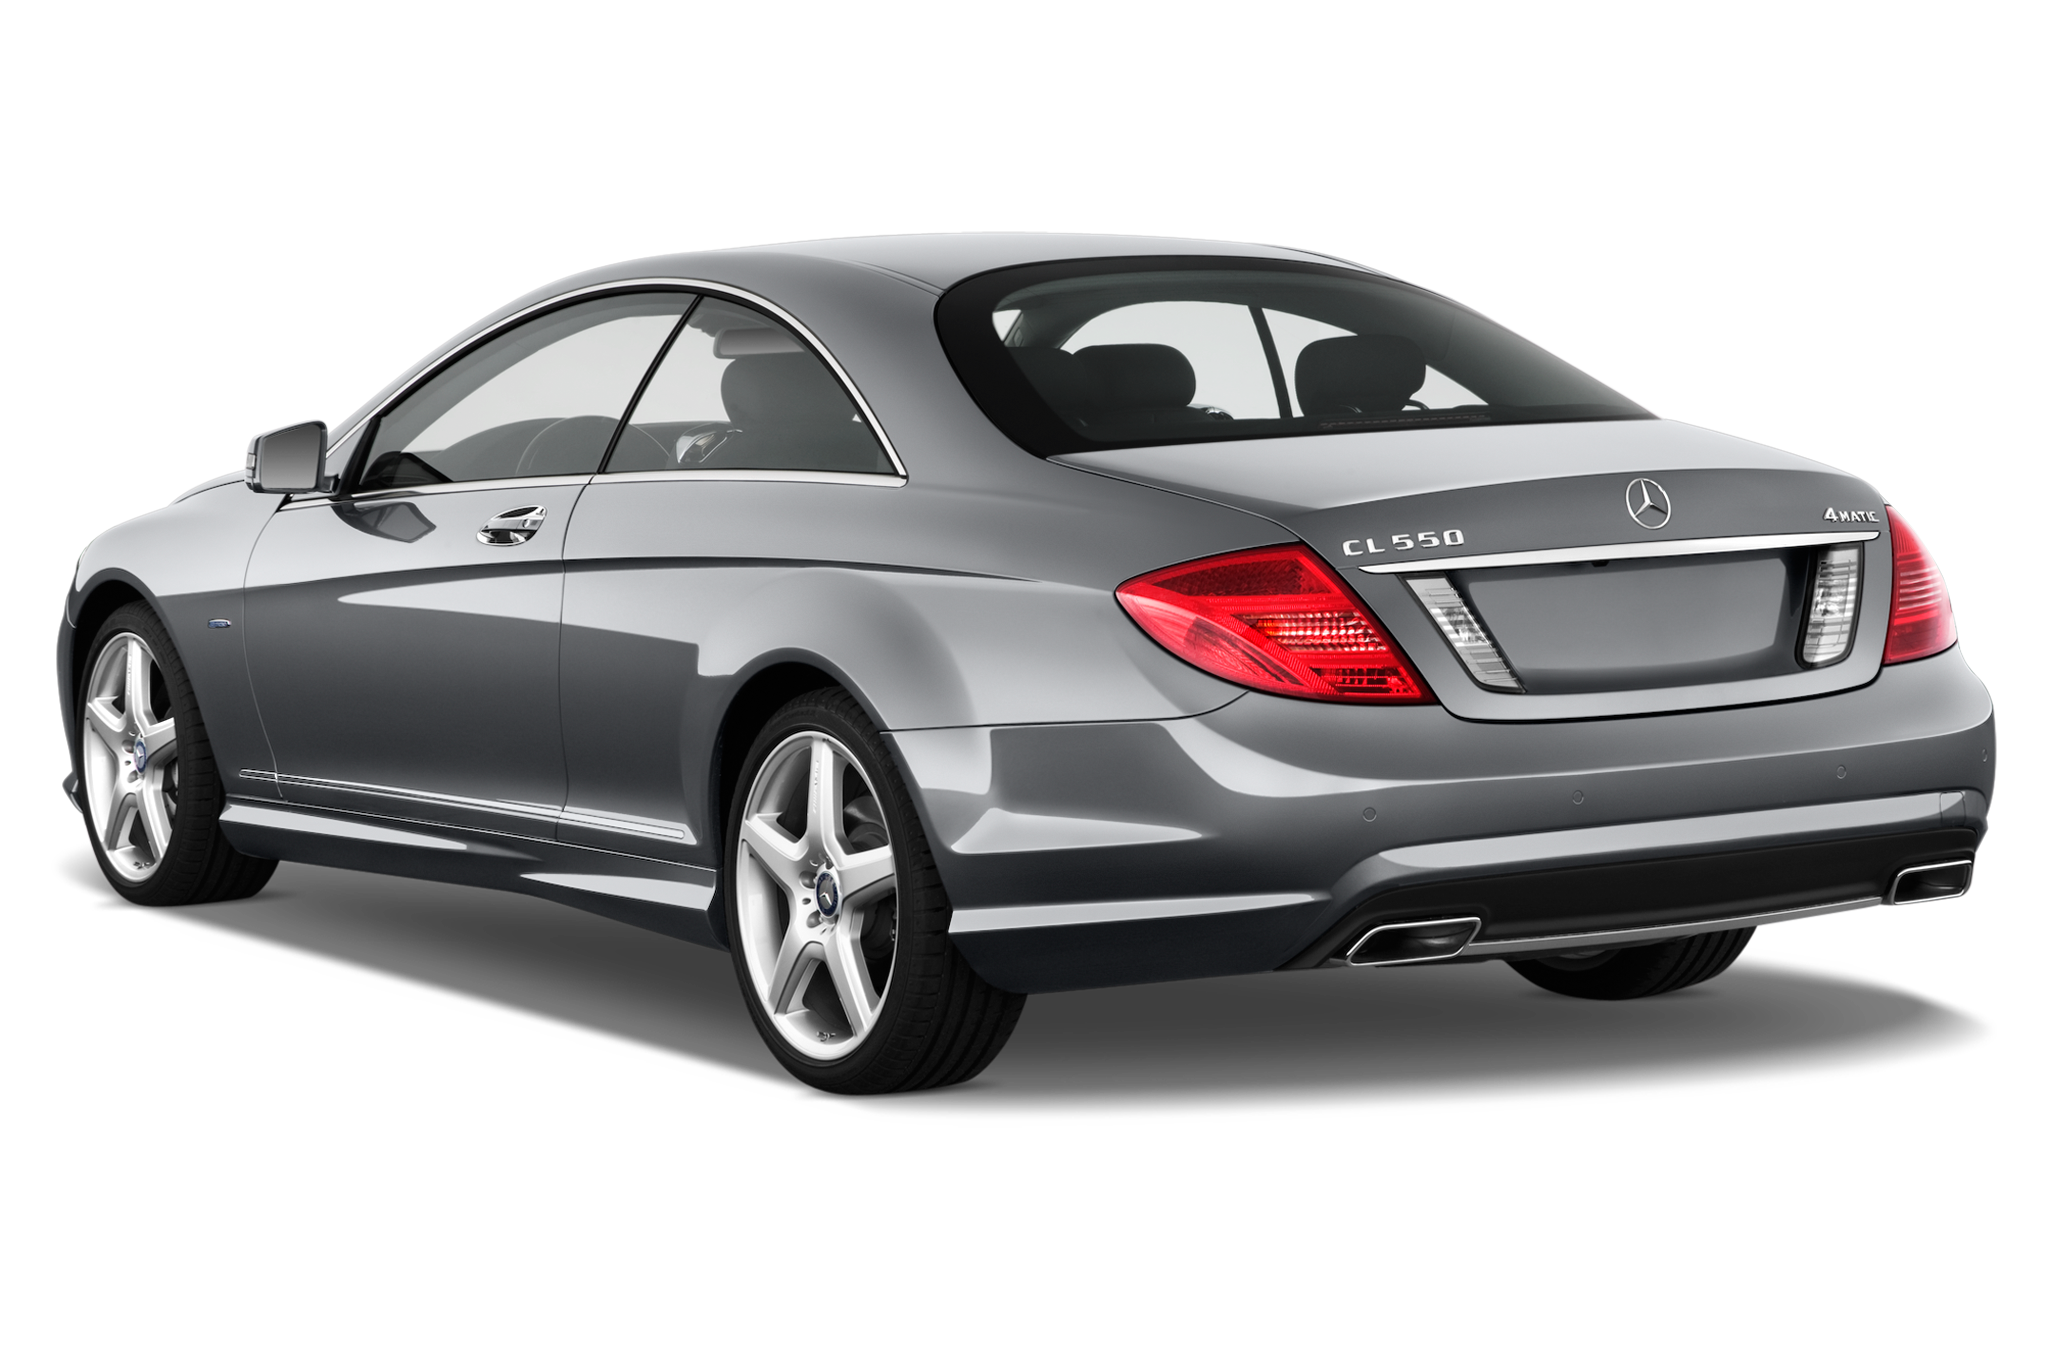 2011 Mercedes Benz Cl550 4matic Automobile Magazine